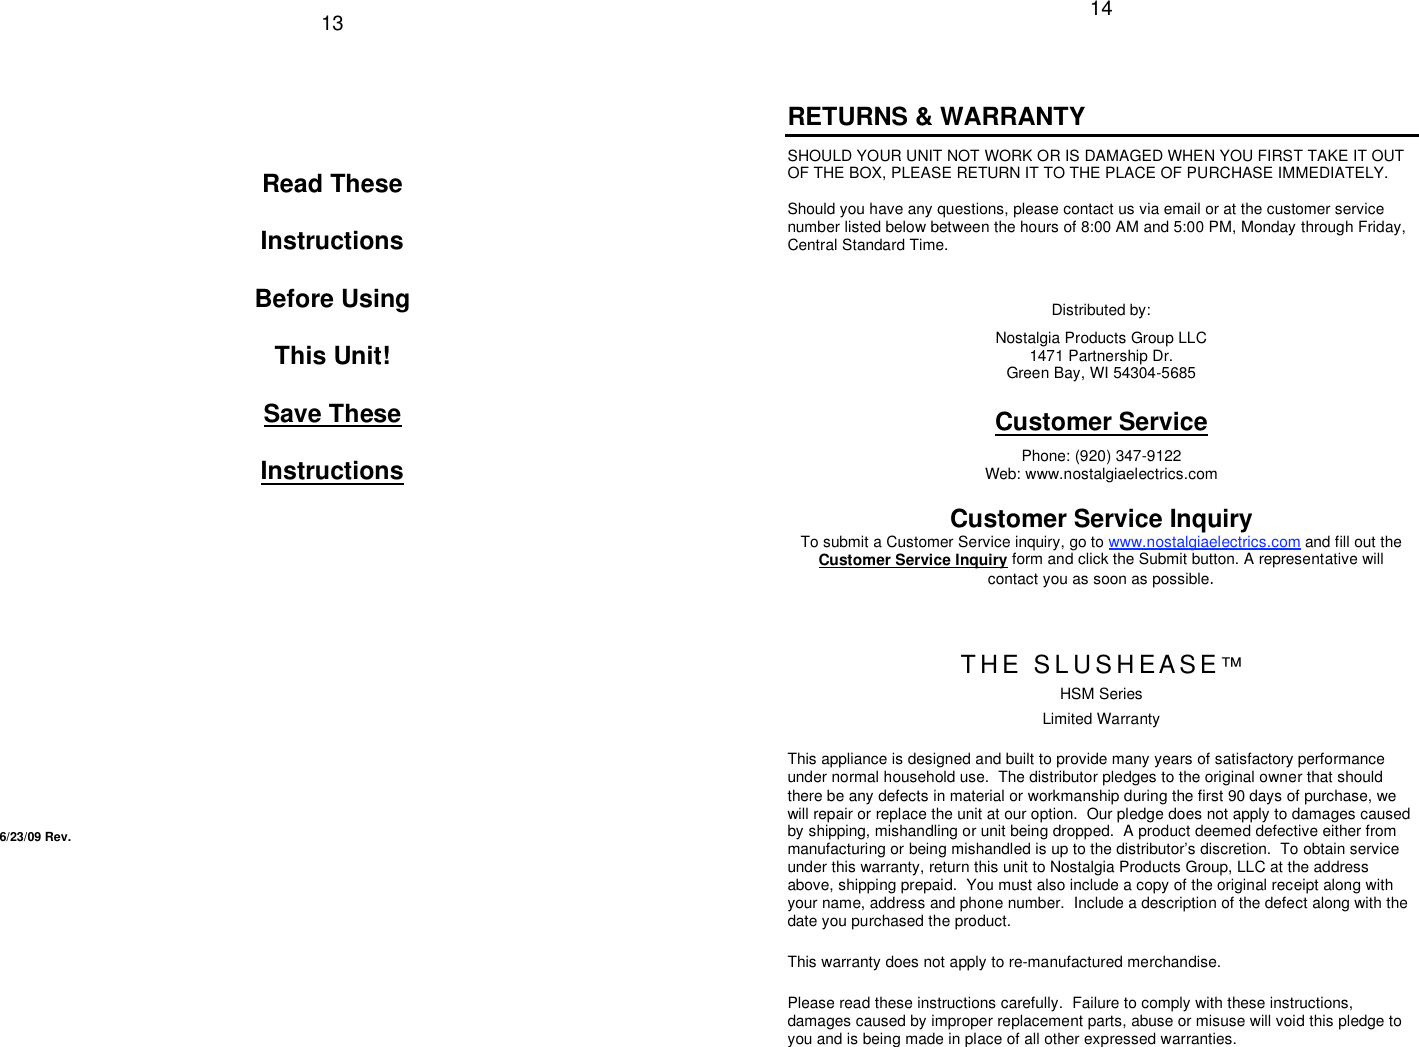 Nostalgia Electrics Slushease Hsm 245 Users Manual Series Eng 6 23 09 Page 2 Of